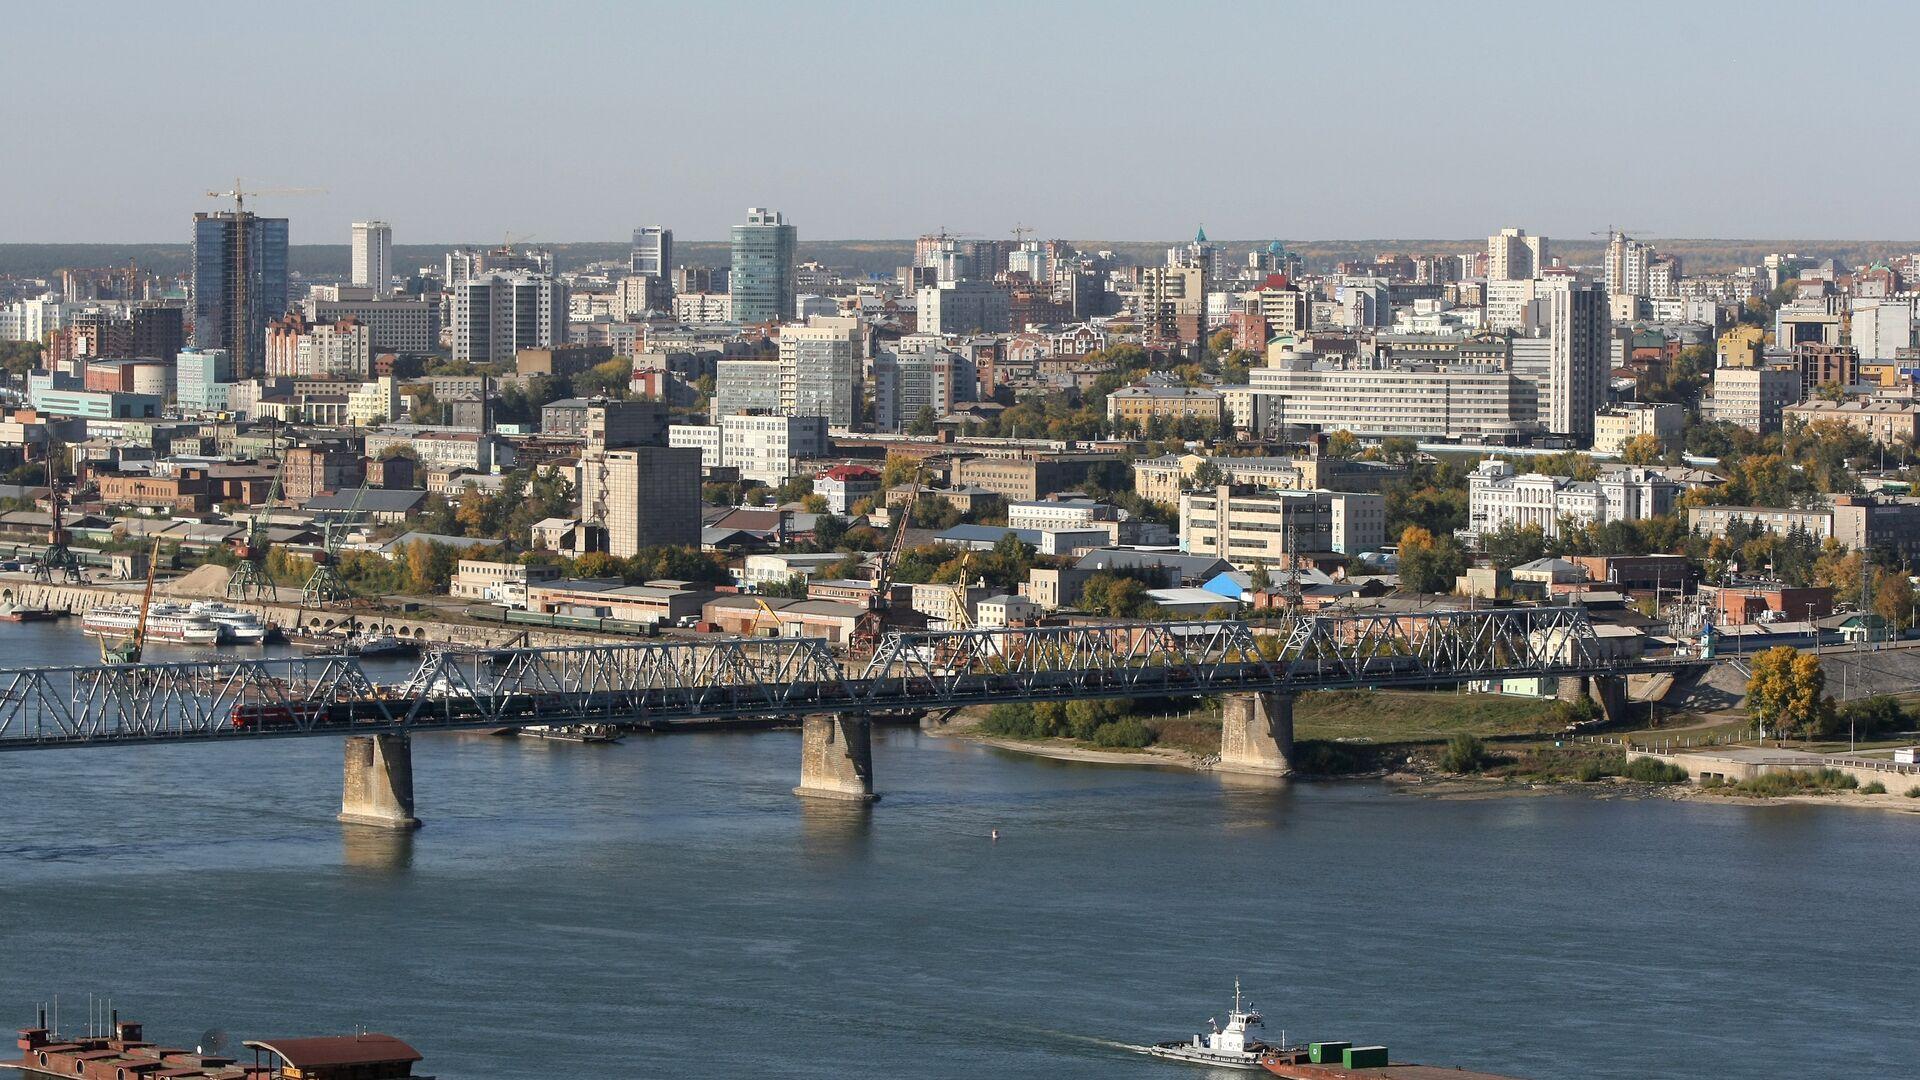 1498345476 0:0:3221:1813 1920x0 80 0 0 ac25502c63161207e351d05e561ff246 - В Новосибирске на уличном экране пустили порно